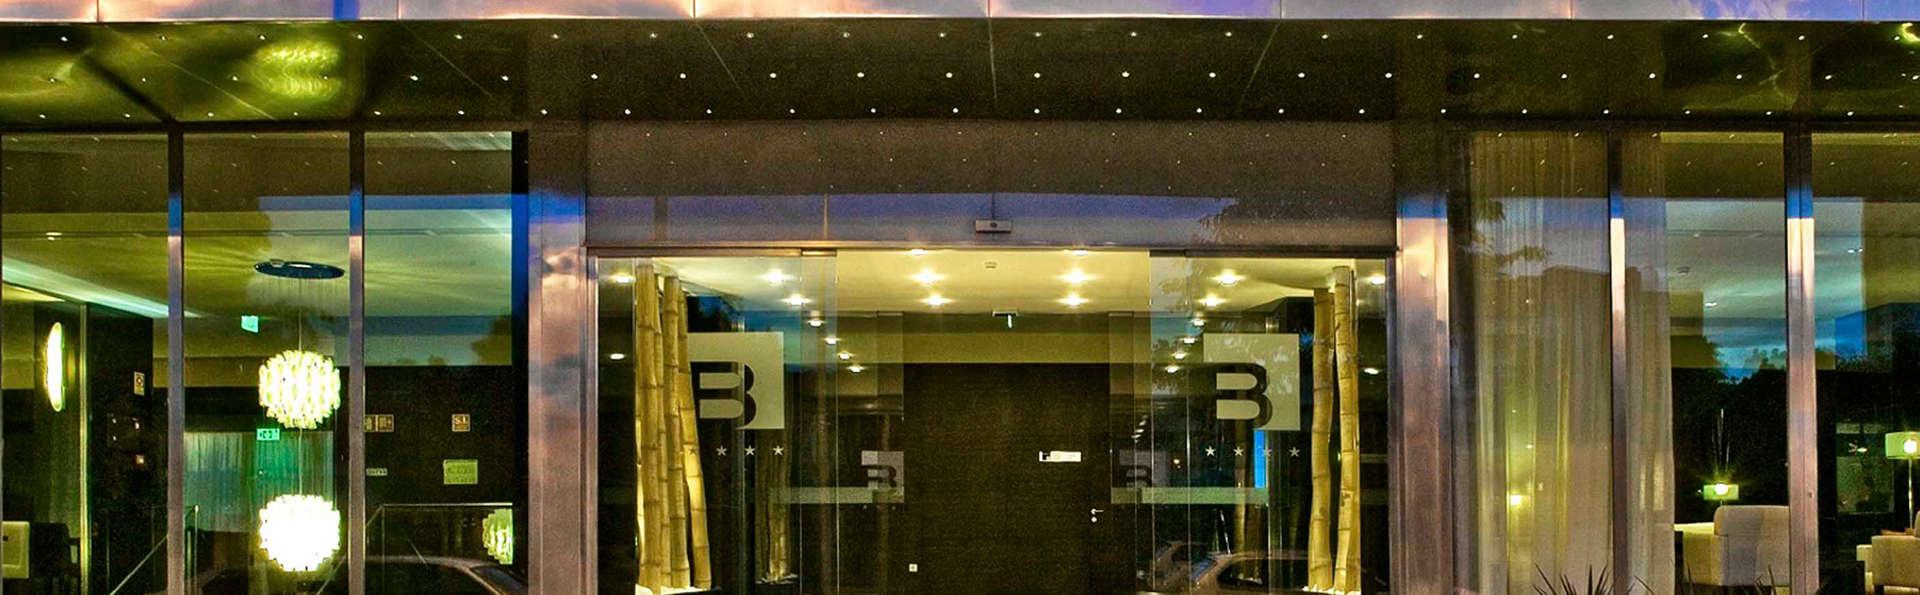 Hotel Bessa Boavista Porto by Ymspyra  - EDIT_front1.jpg